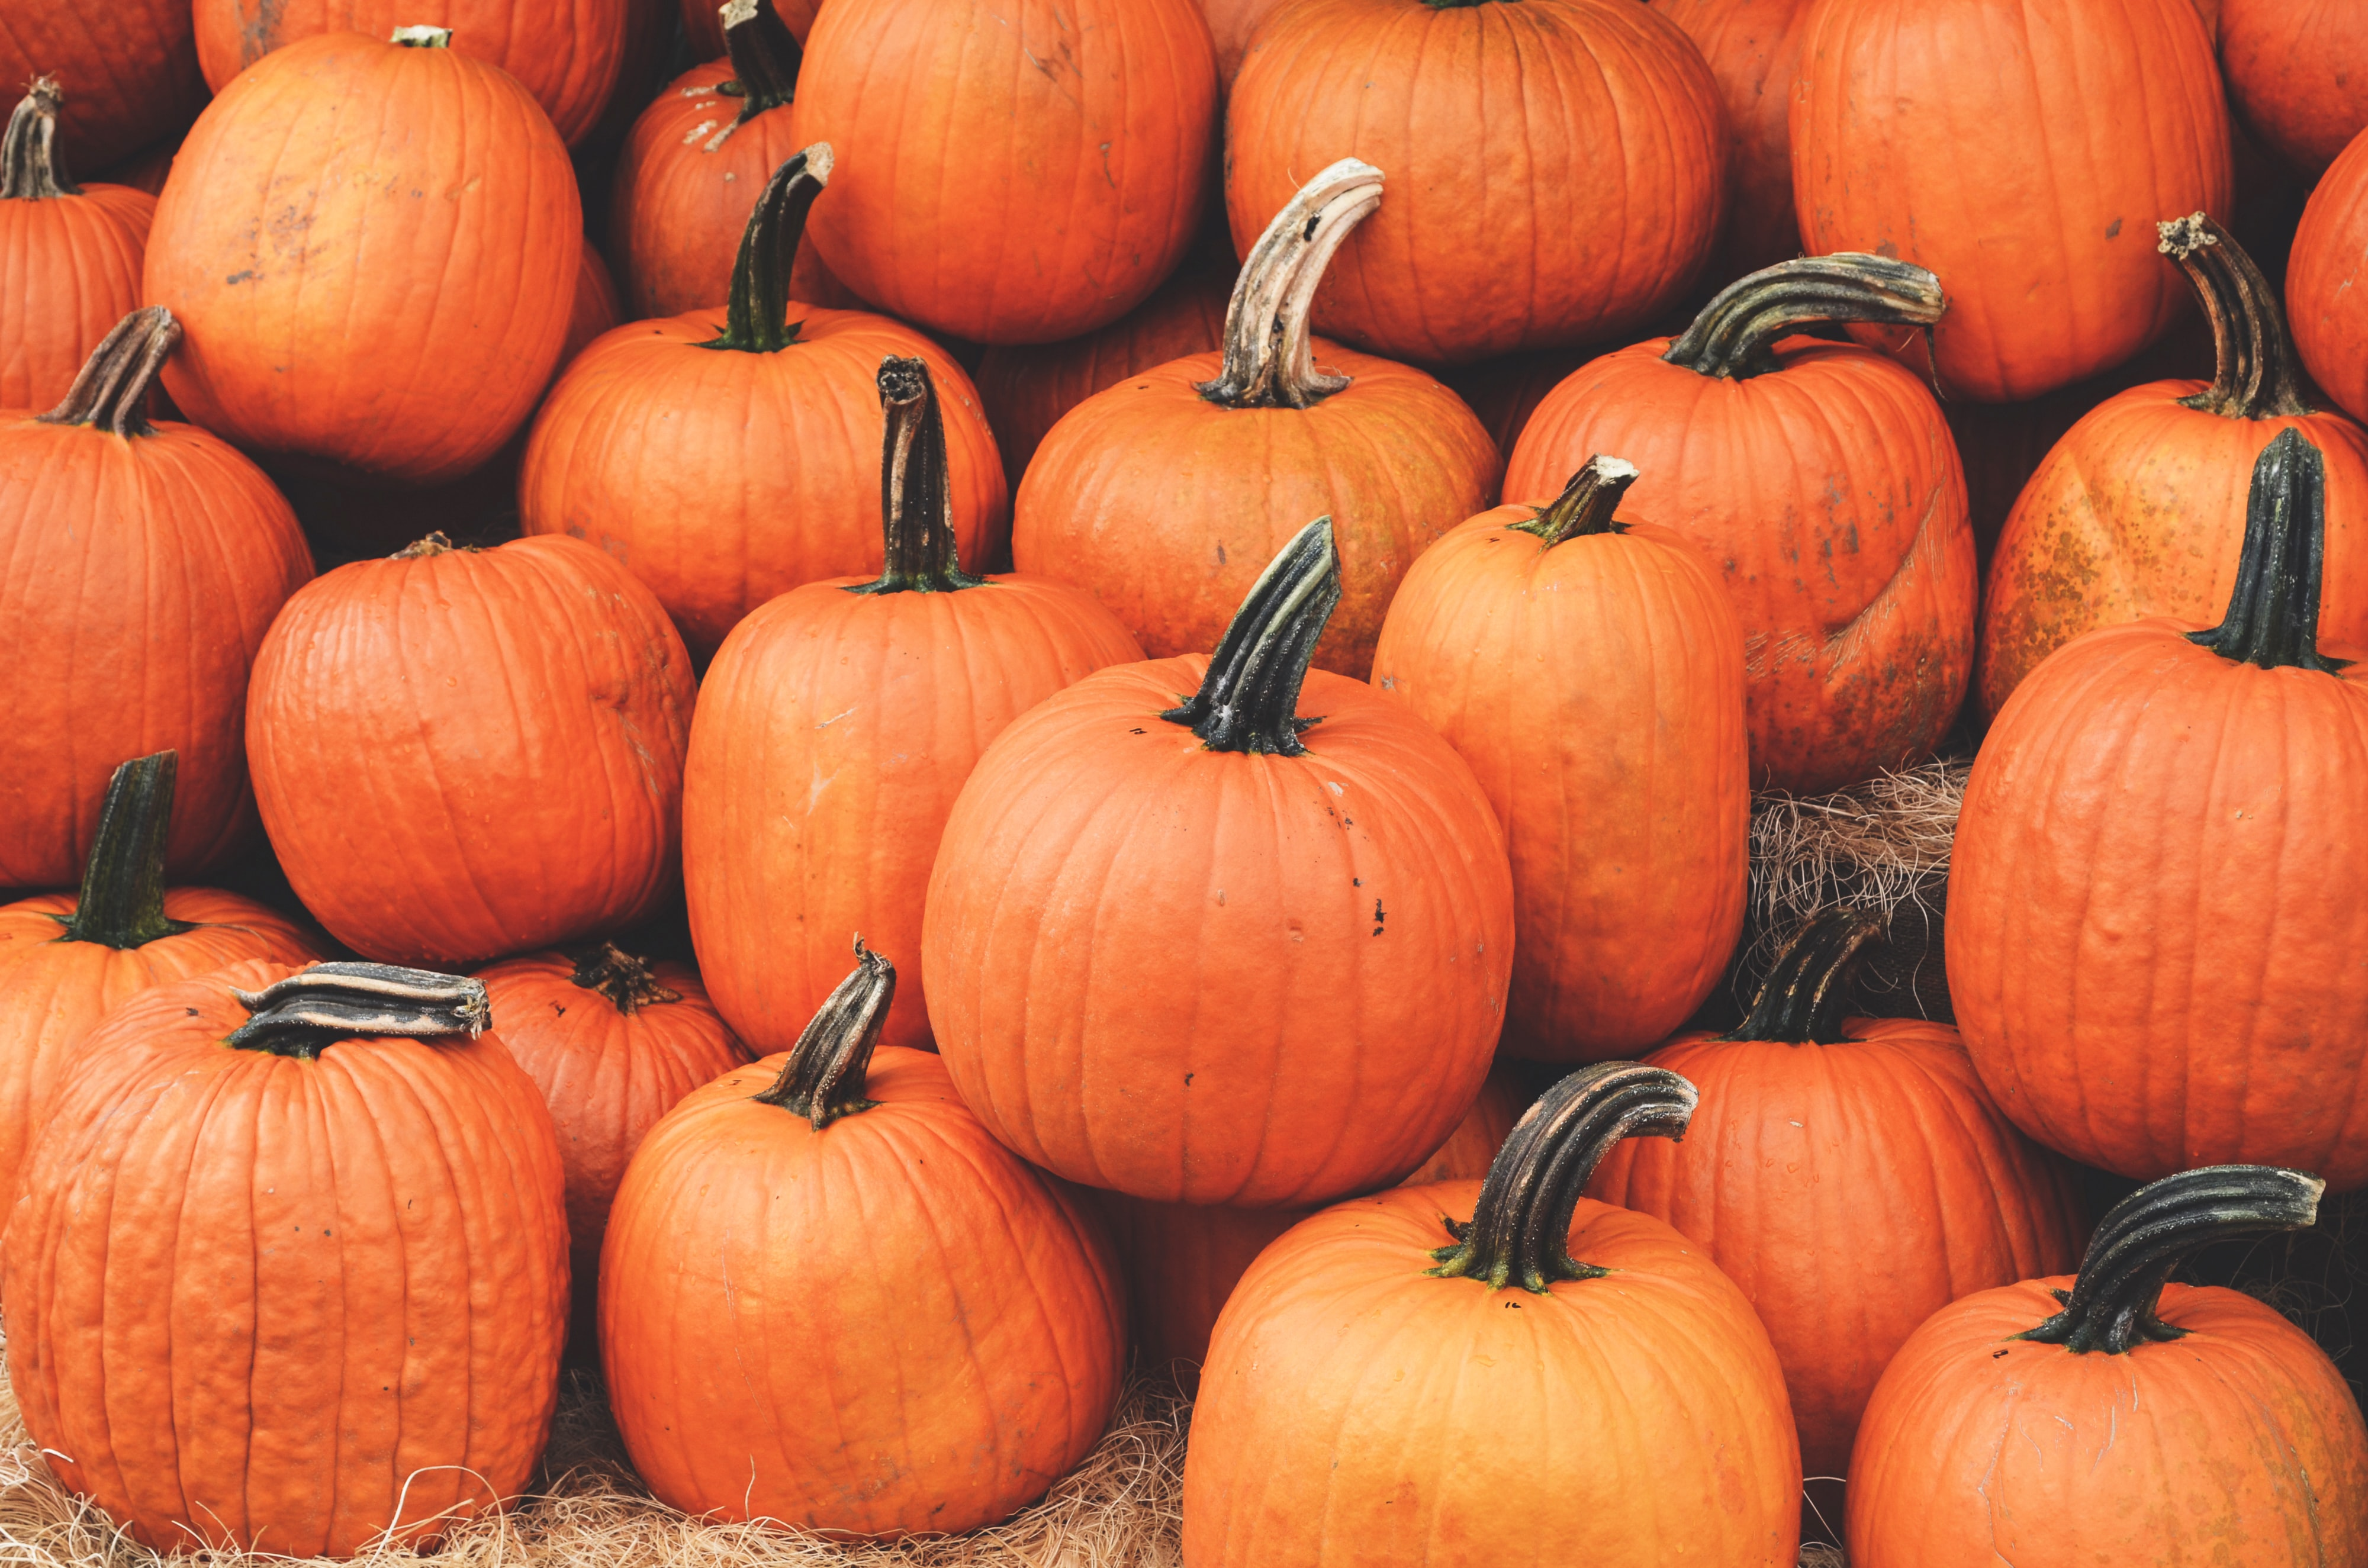 PYO Pumpkins at Primrose Vale